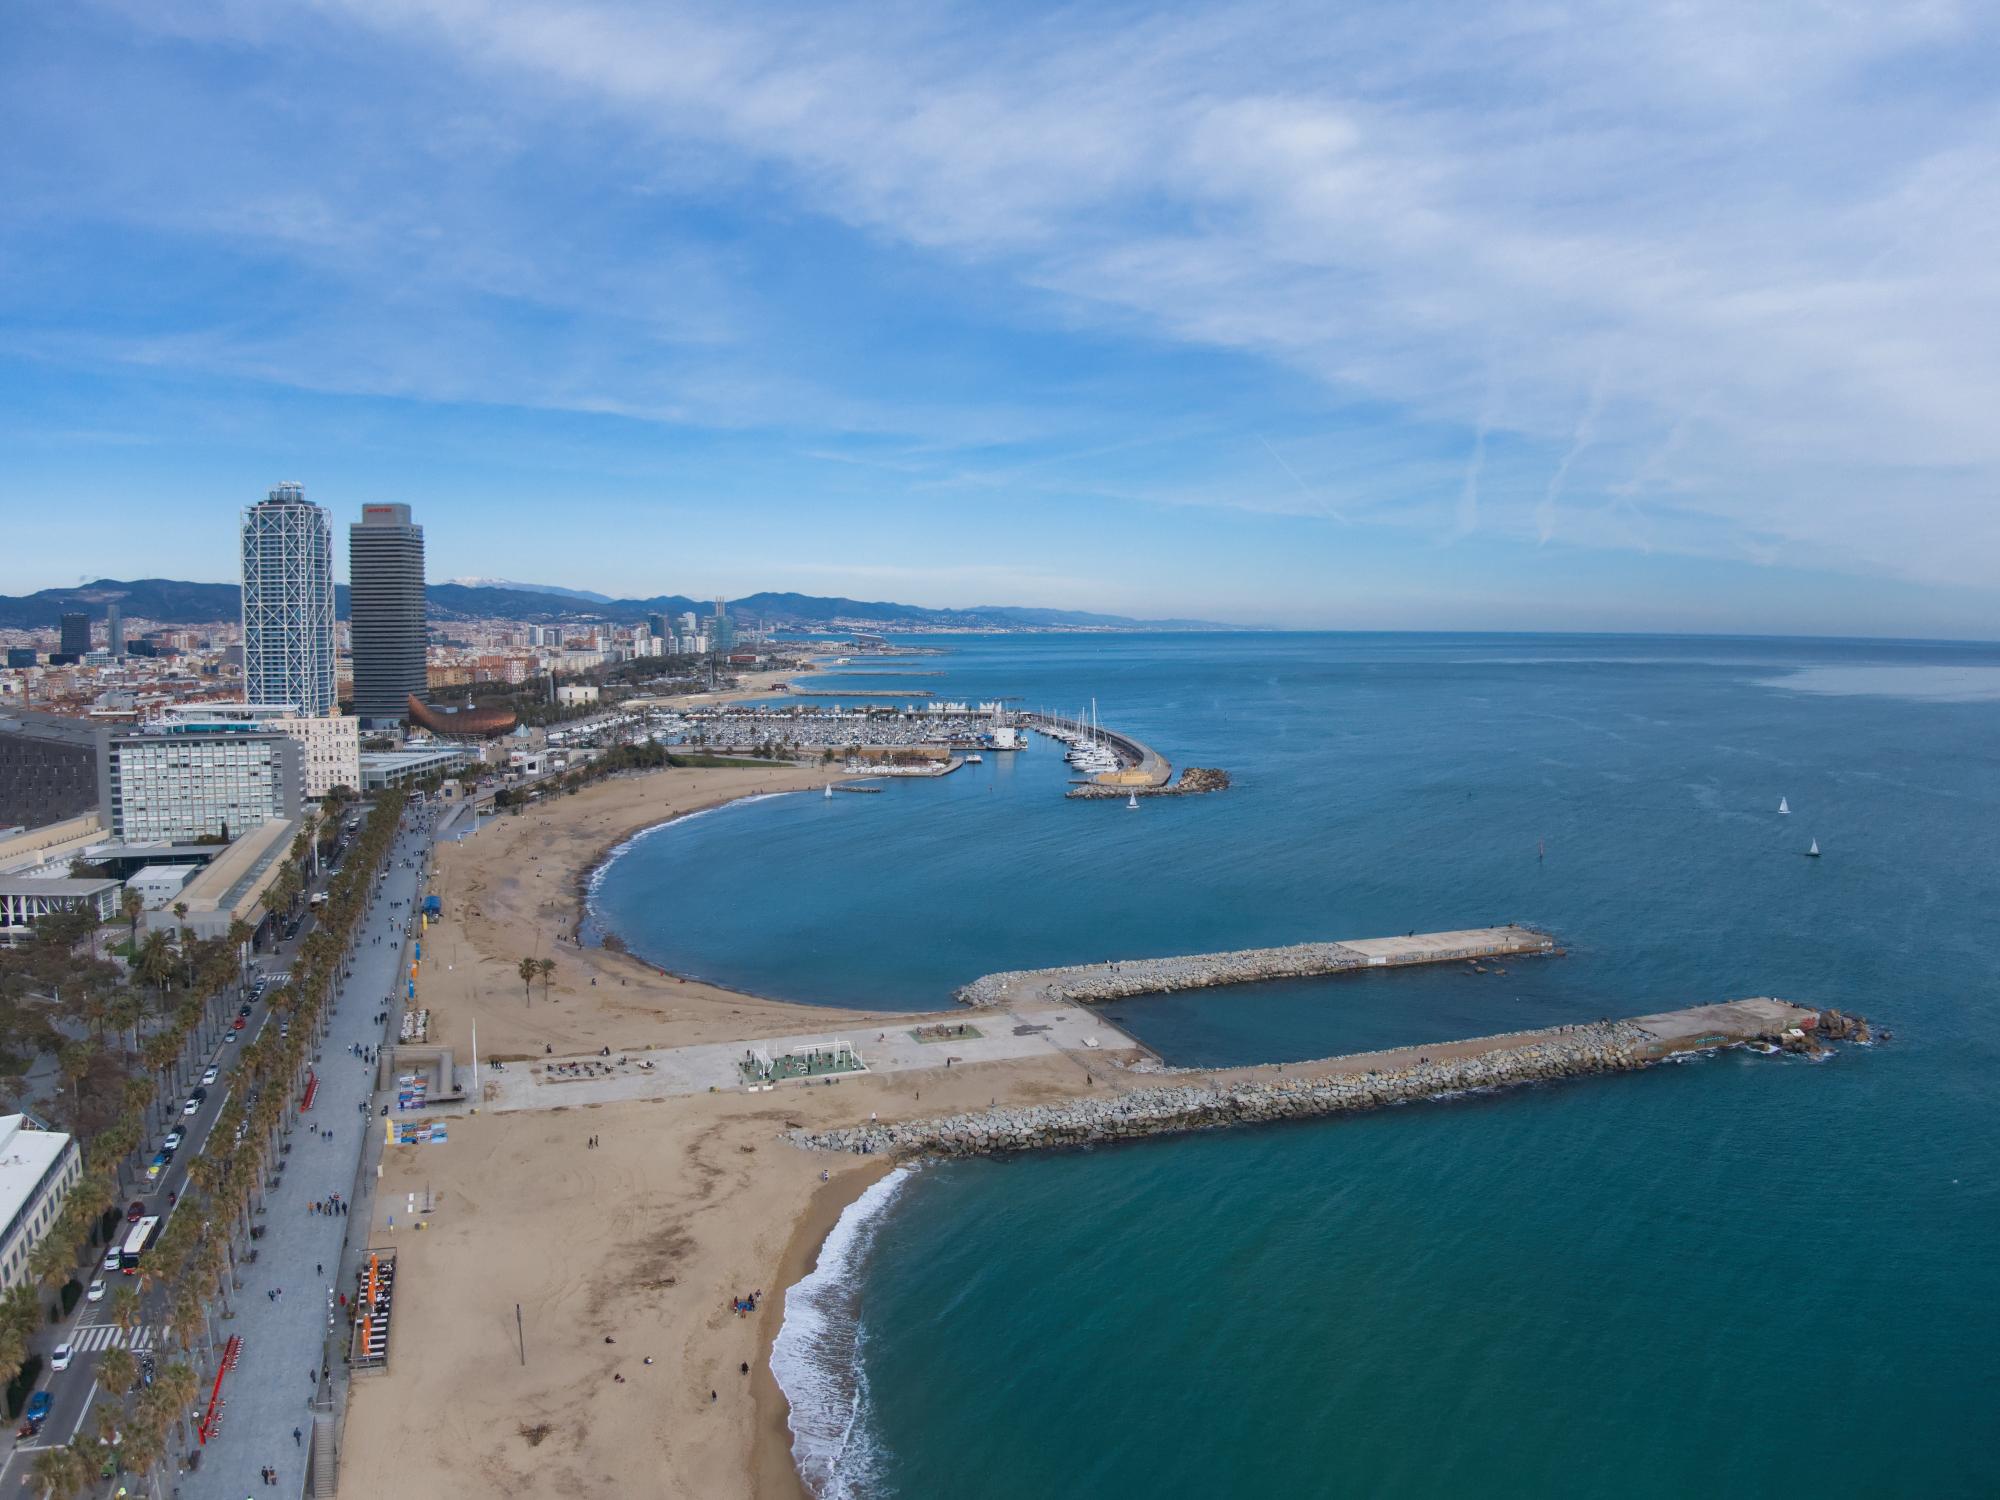 playa de barceloneta, in Barcelona, Spain during a sunny winter day.